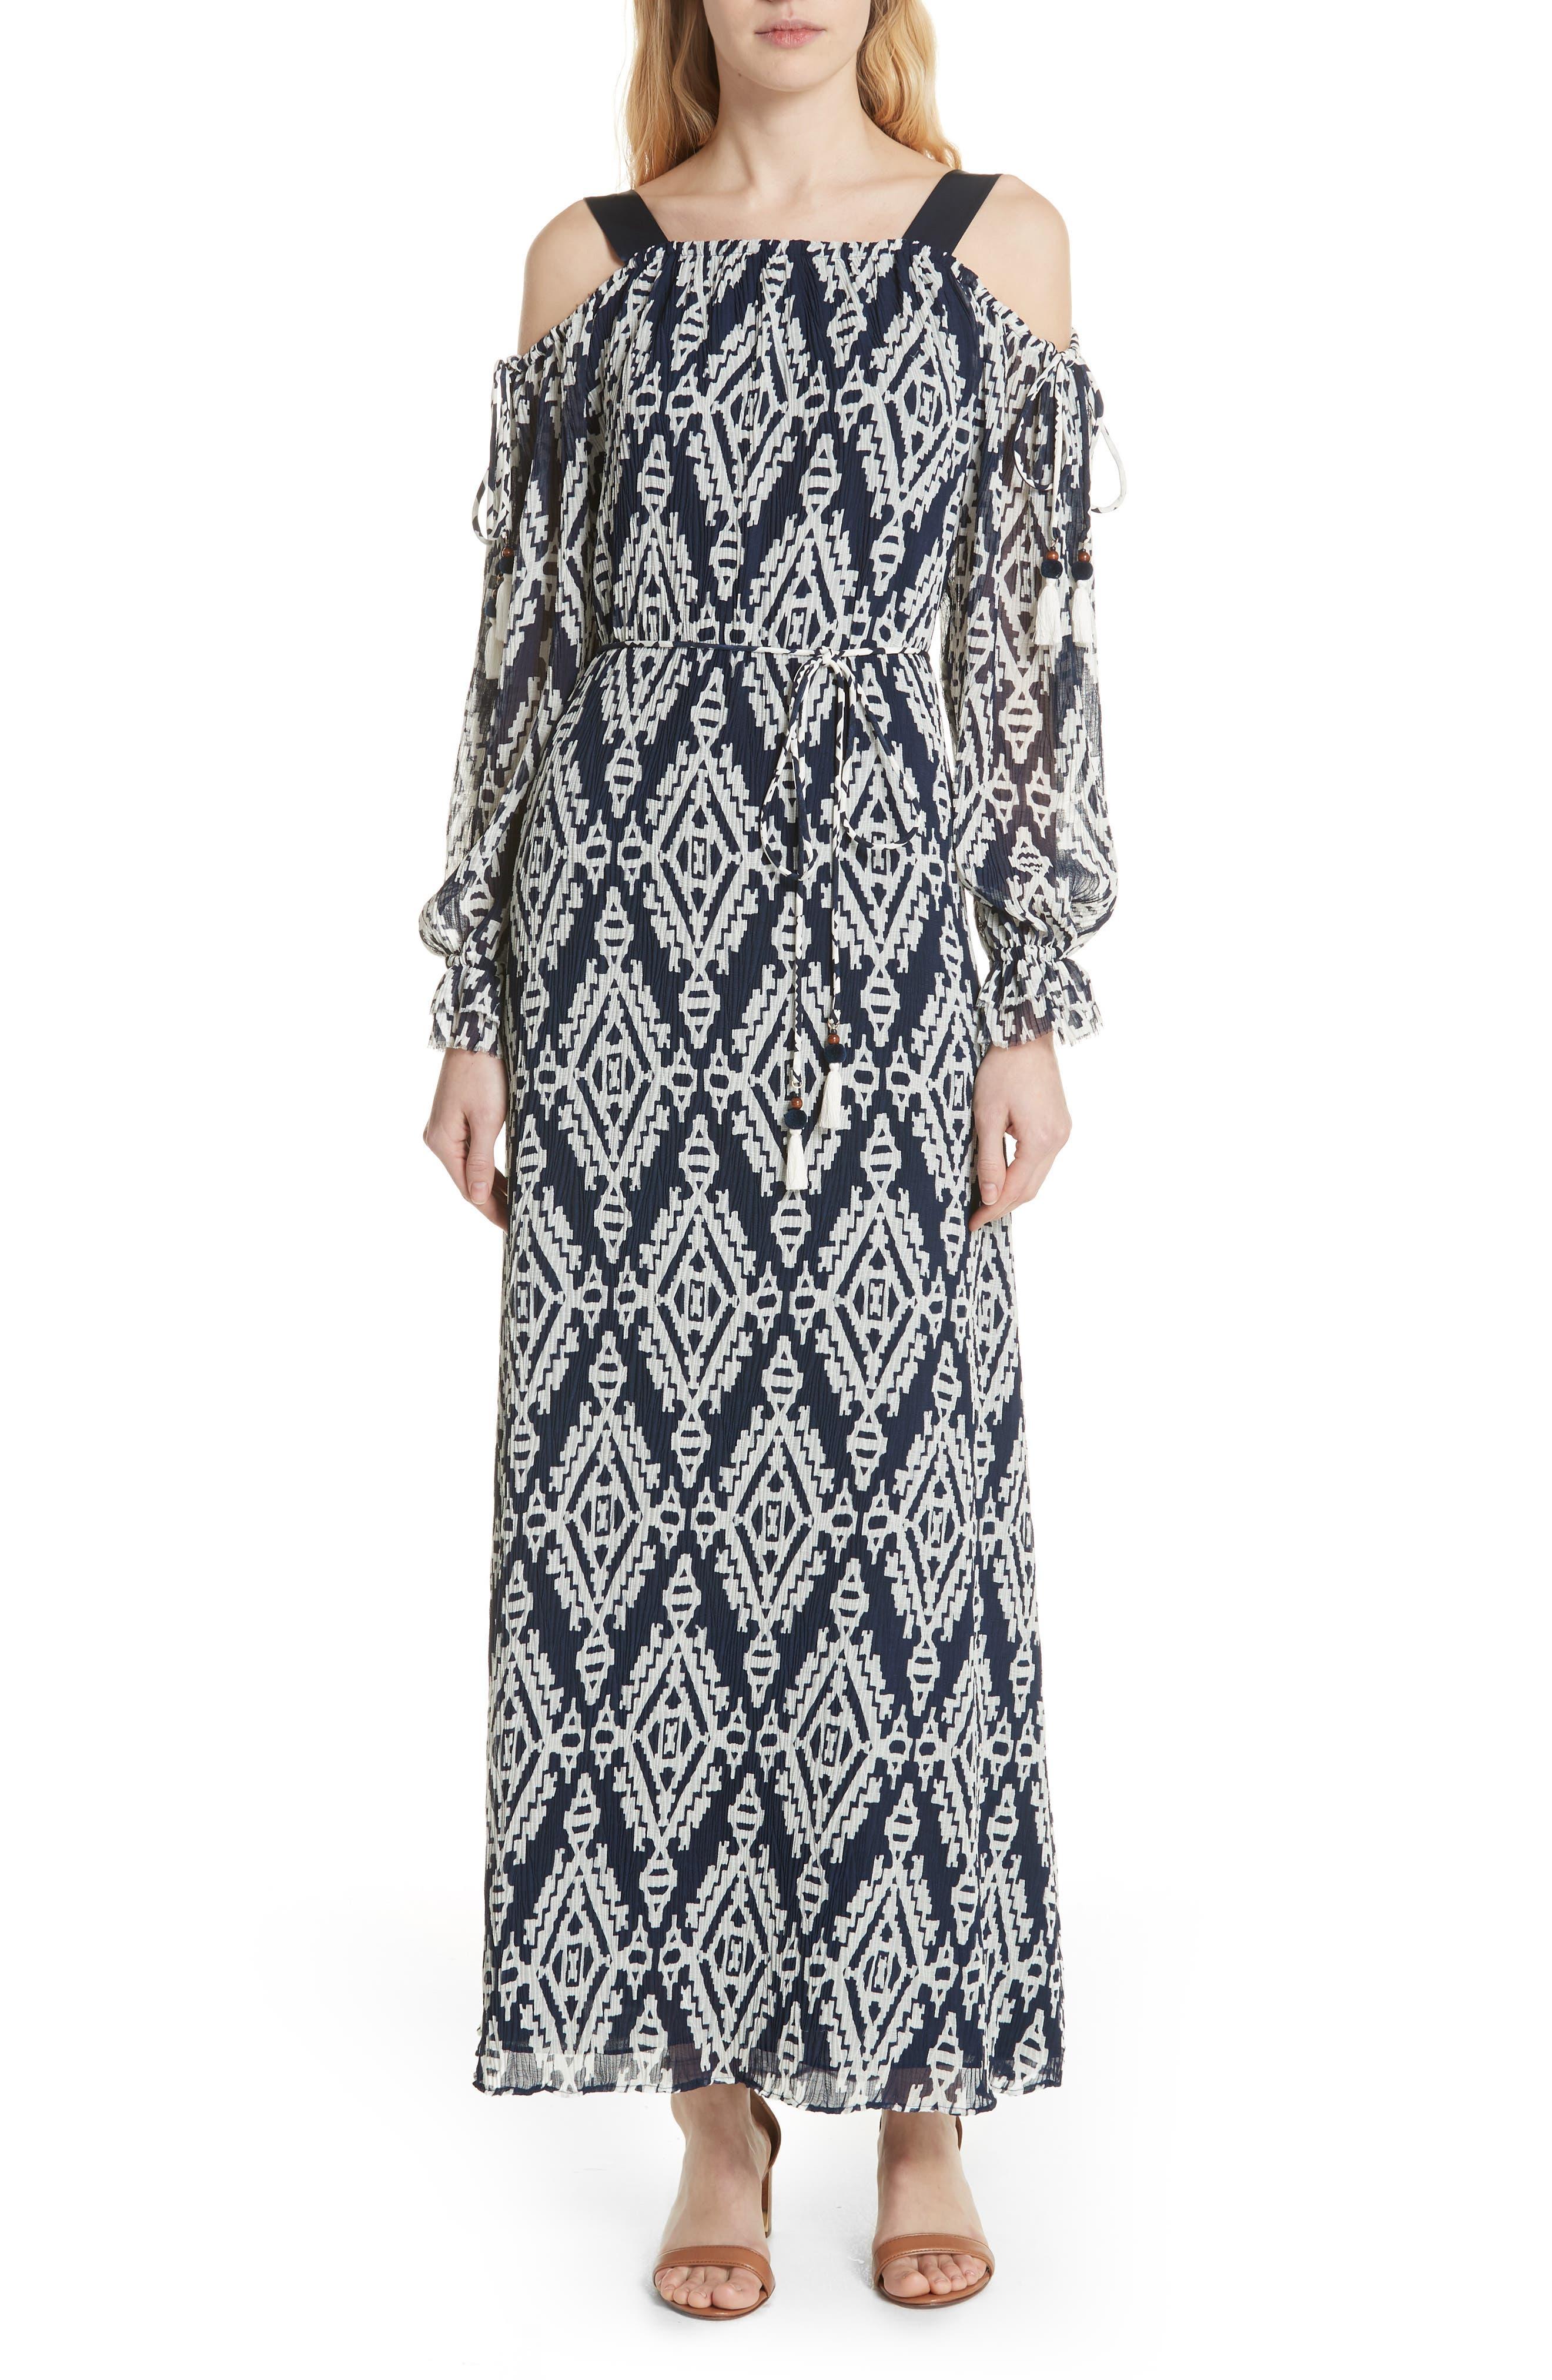 Tory Burch Katherine Maxi Dress